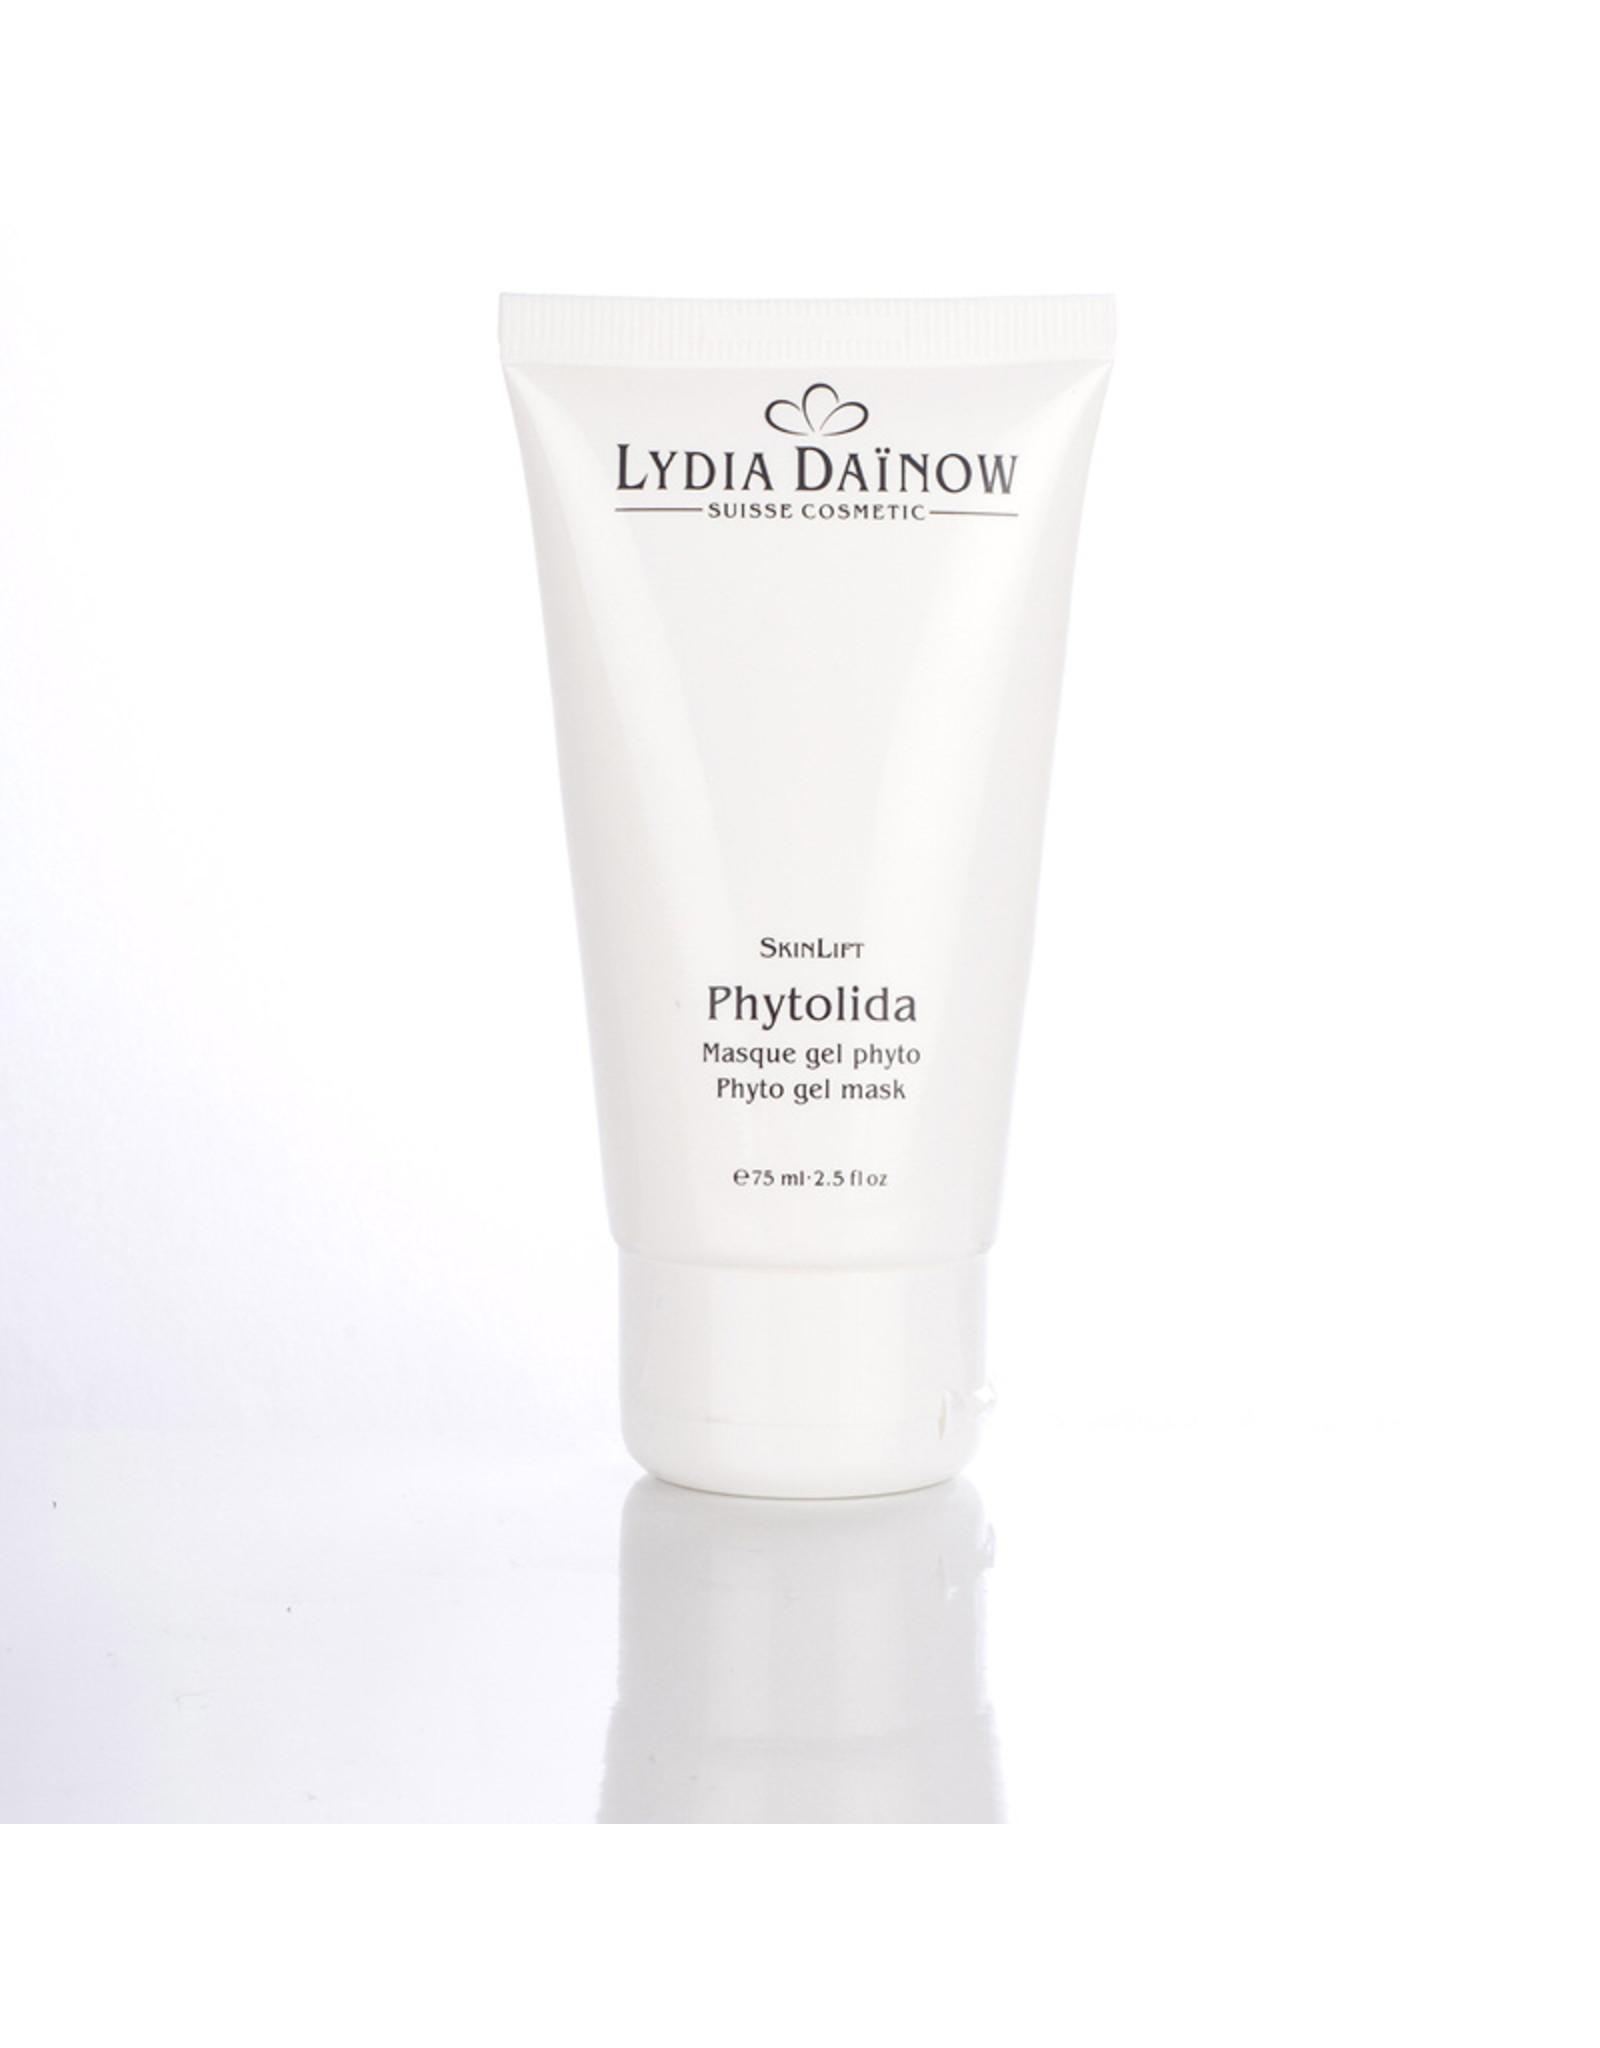 Lydïa Dainow Phytolida -Masque gel raffermissant